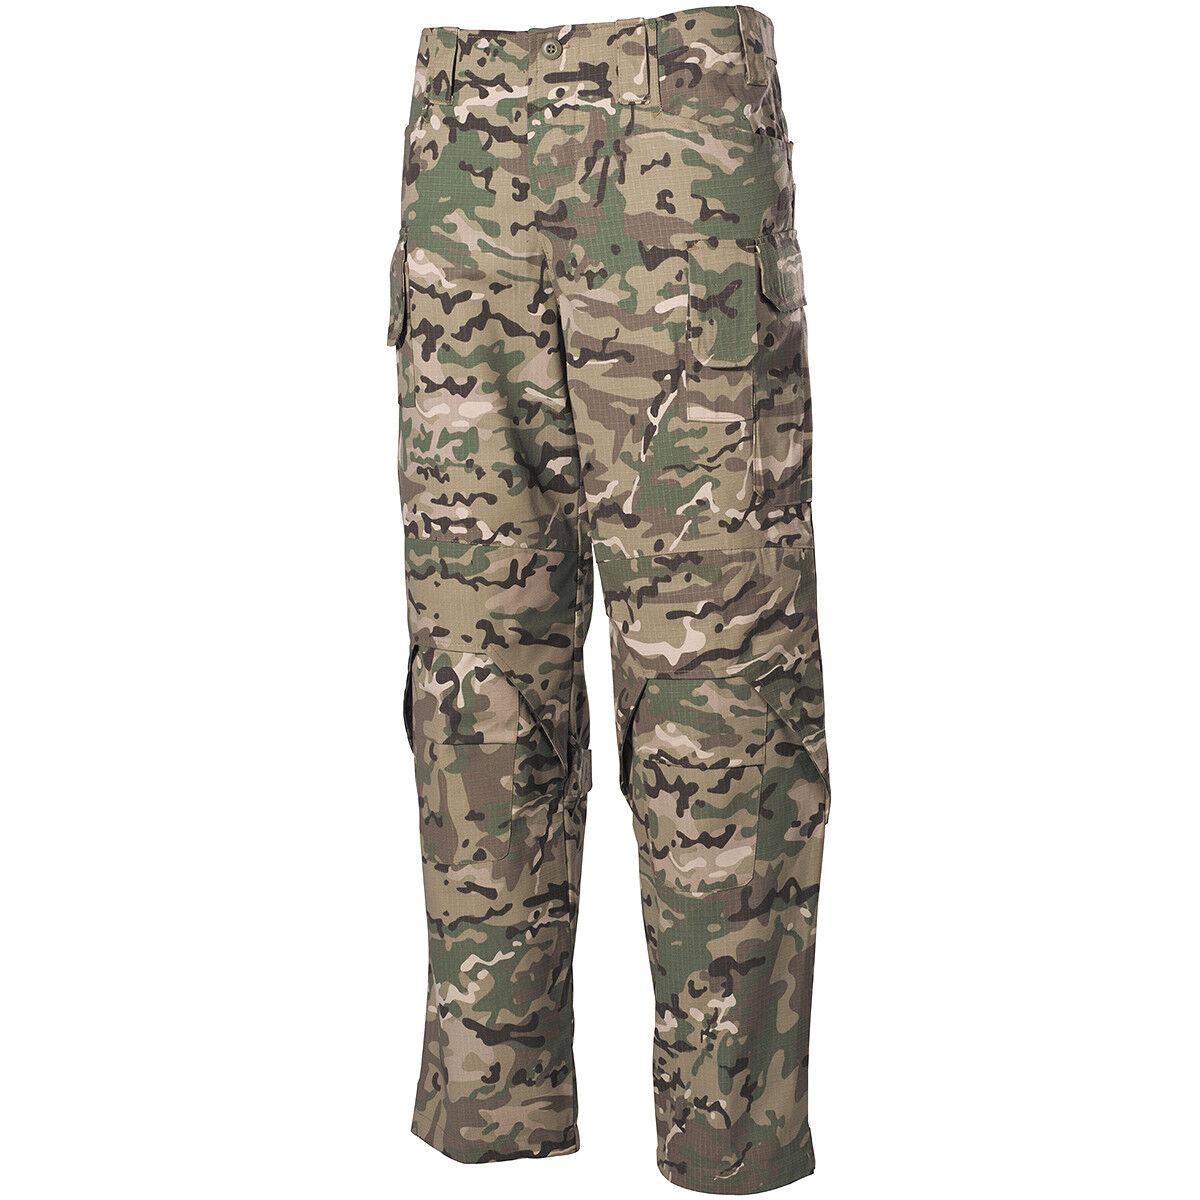 Mfh Mission Bekämpfung Hose Nyco Ripstop Militär Cargo Pants Operation Camo